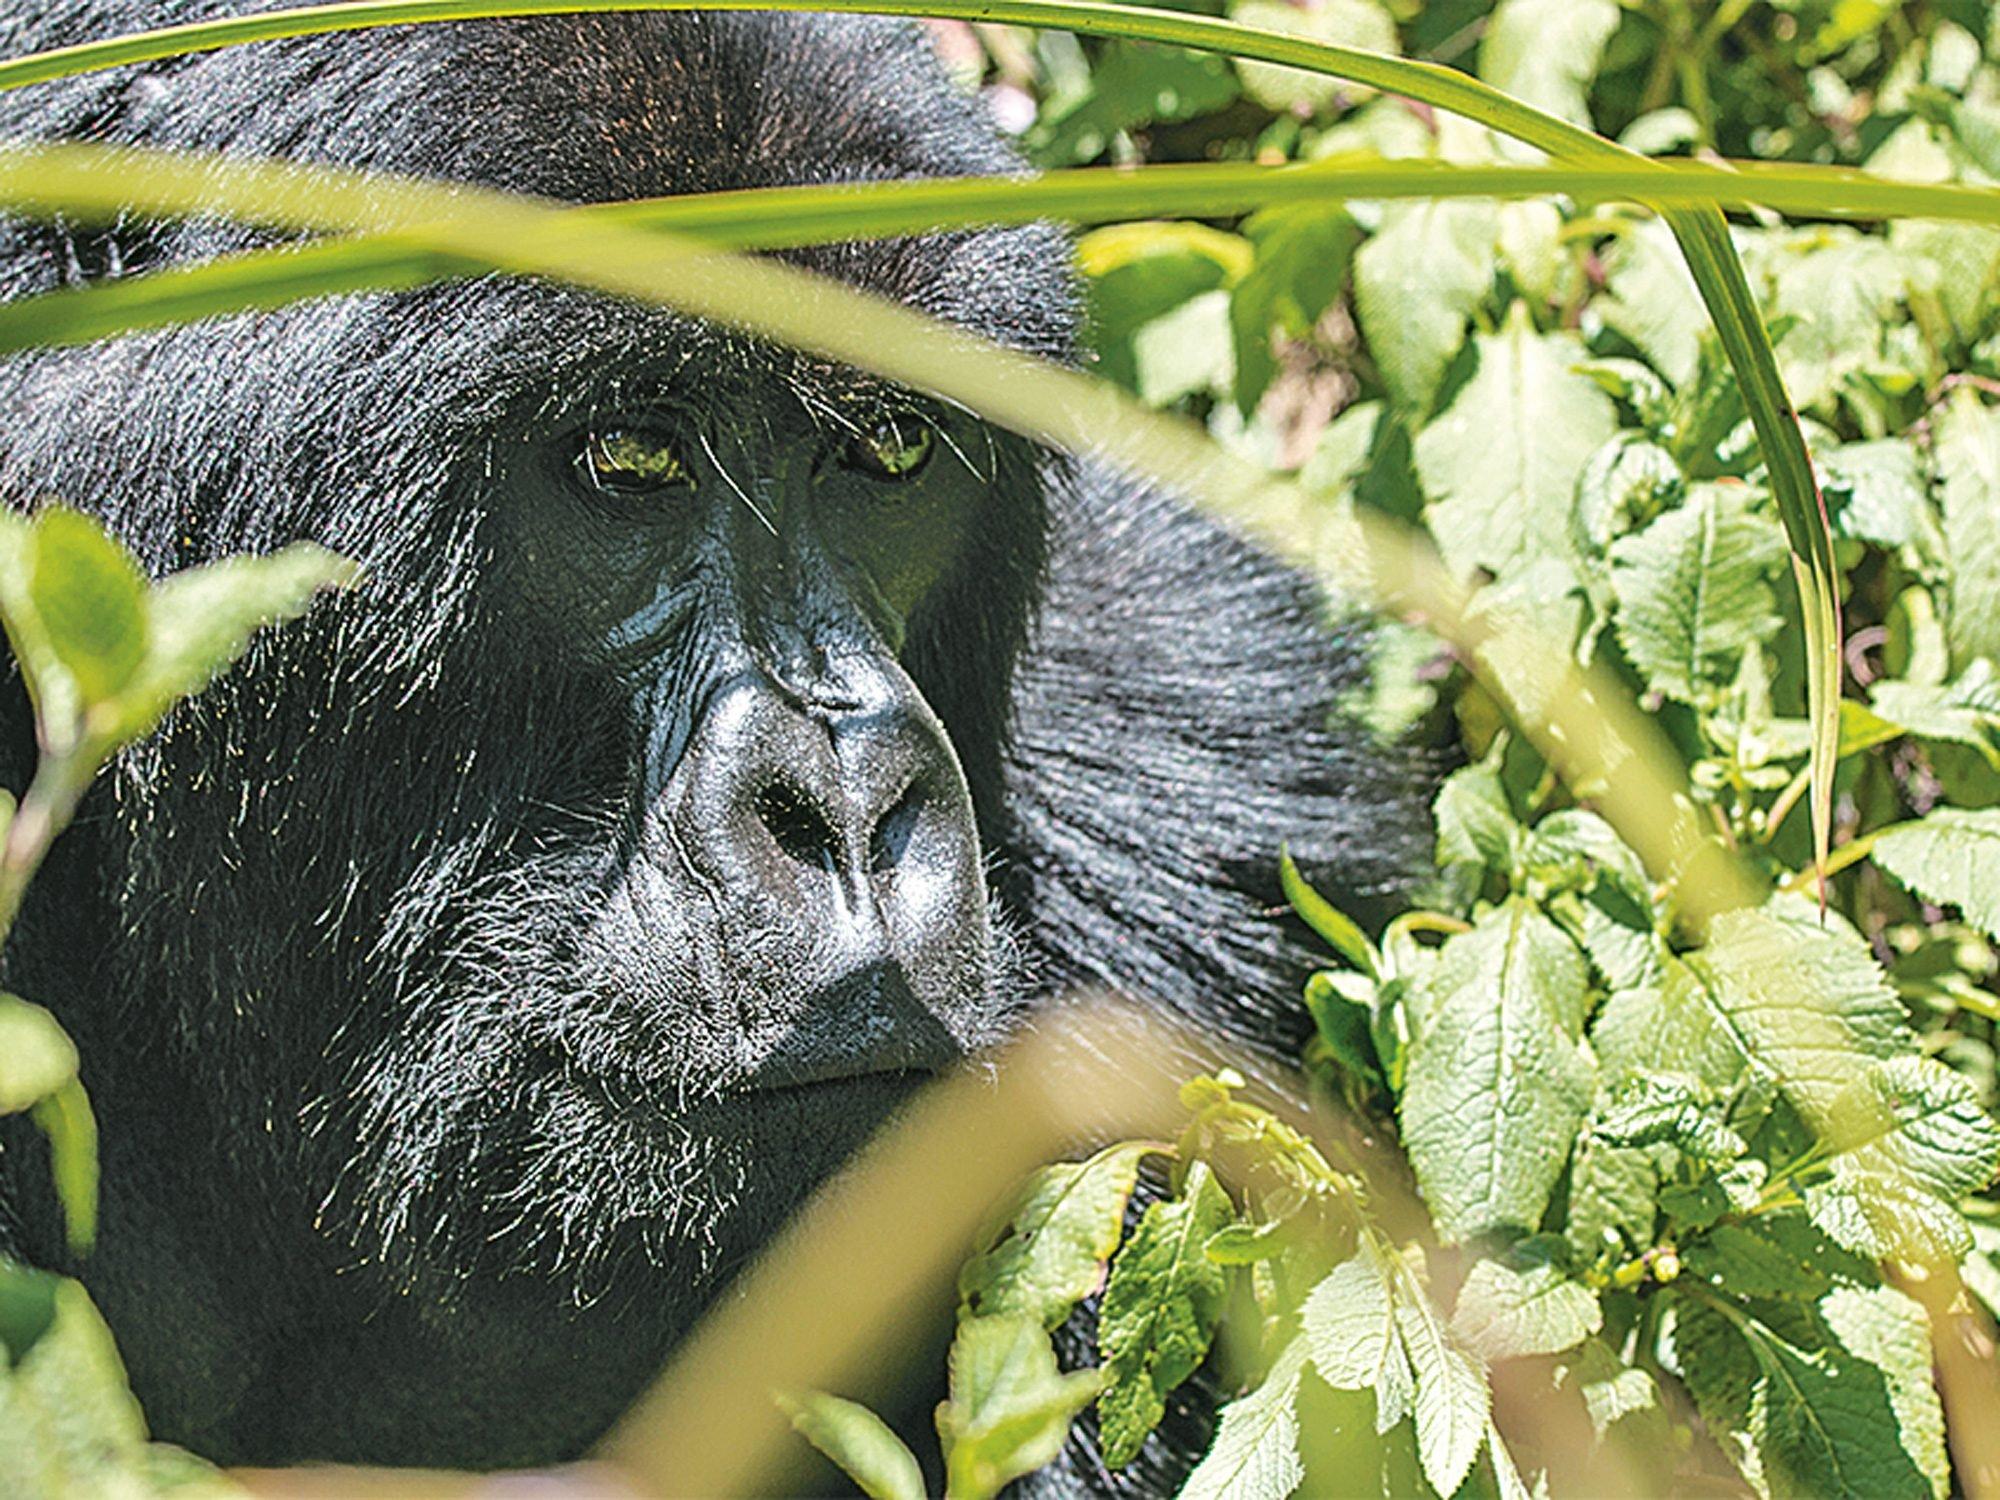 Among the Apes: Gorilla Trekking in Rwanda